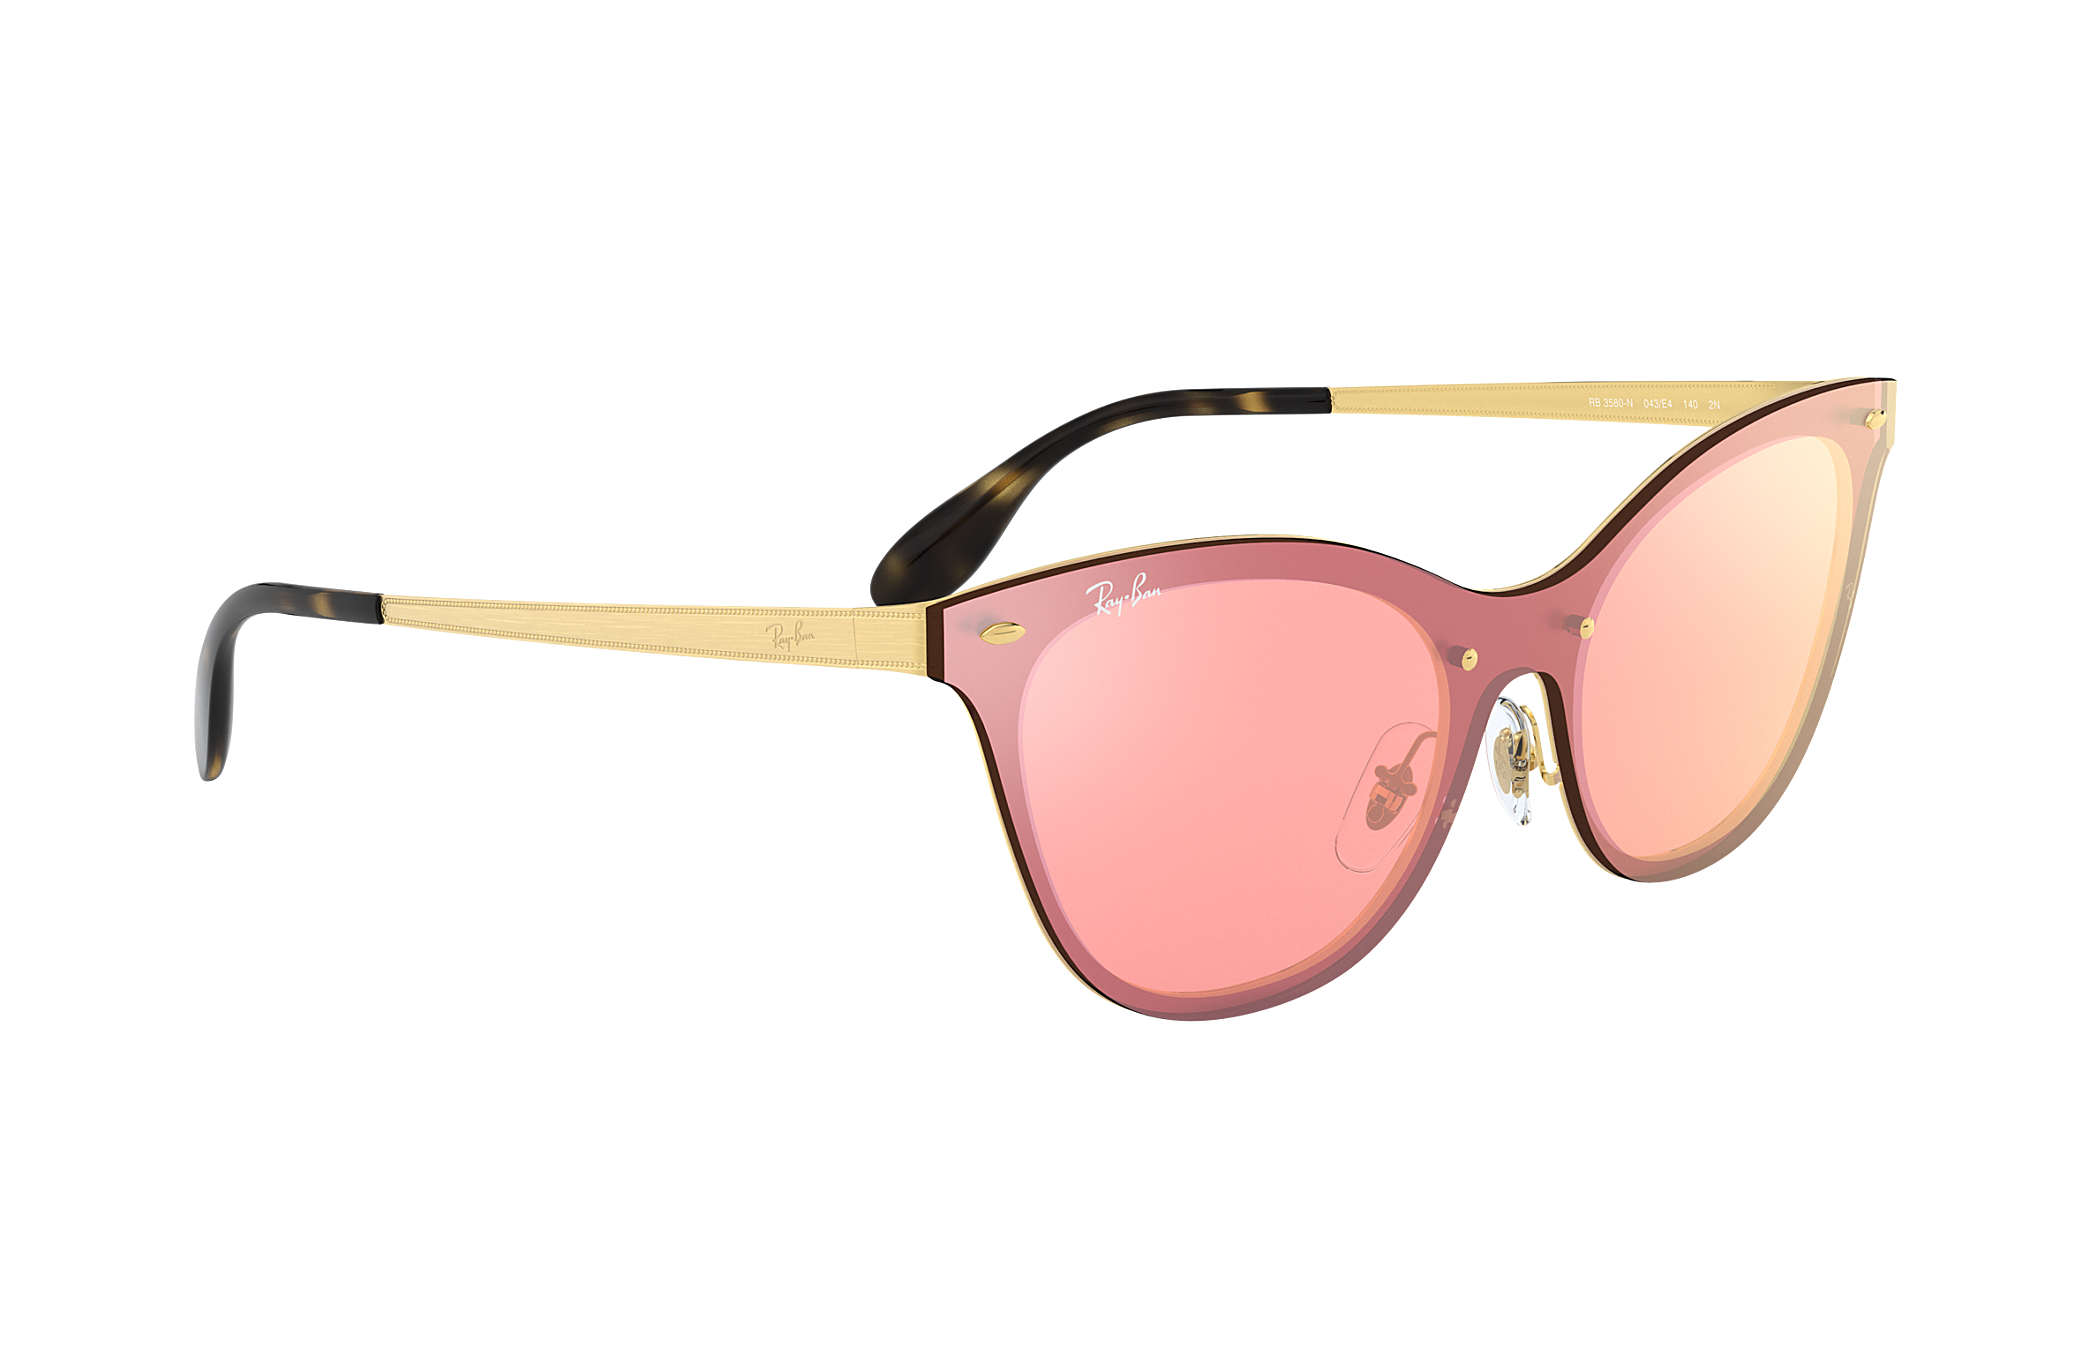 8f2c9caf49 Ray-Ban Blaze Cat Eye RB3580N Gold - Steel - Pink Lenses ...